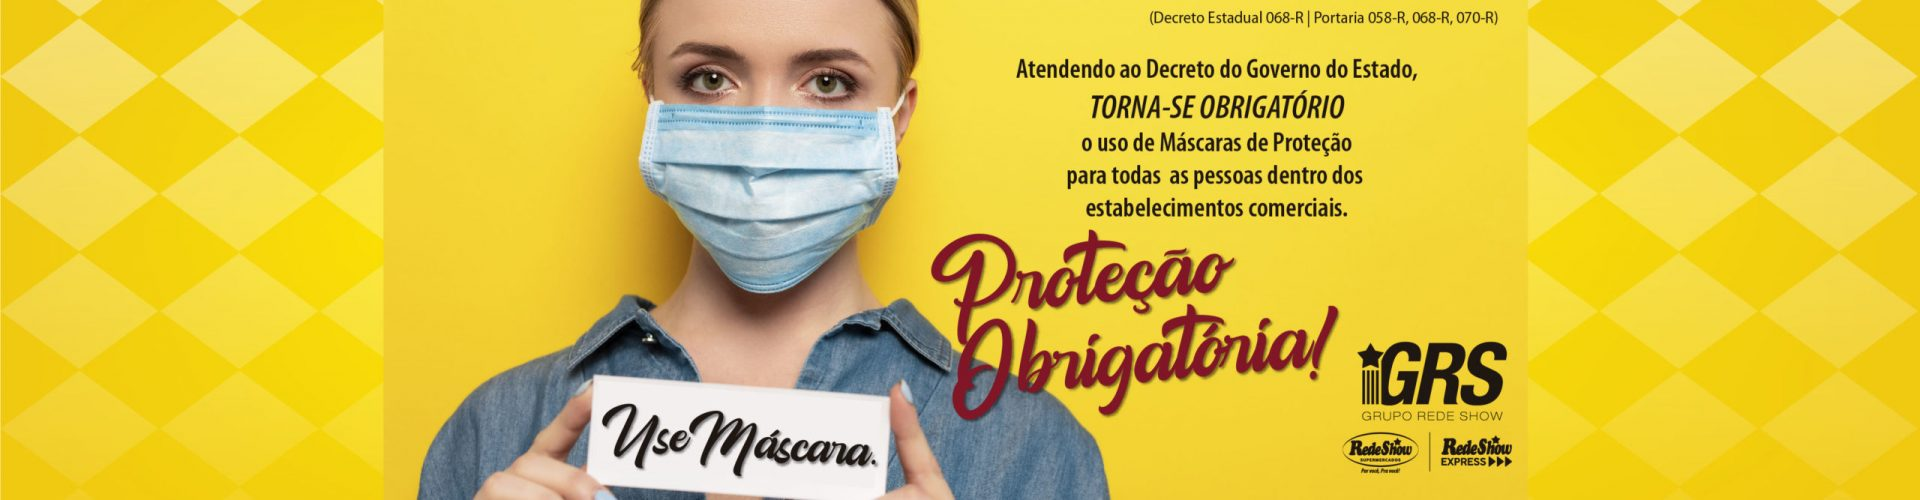 Banner-site_seja use mascara_1